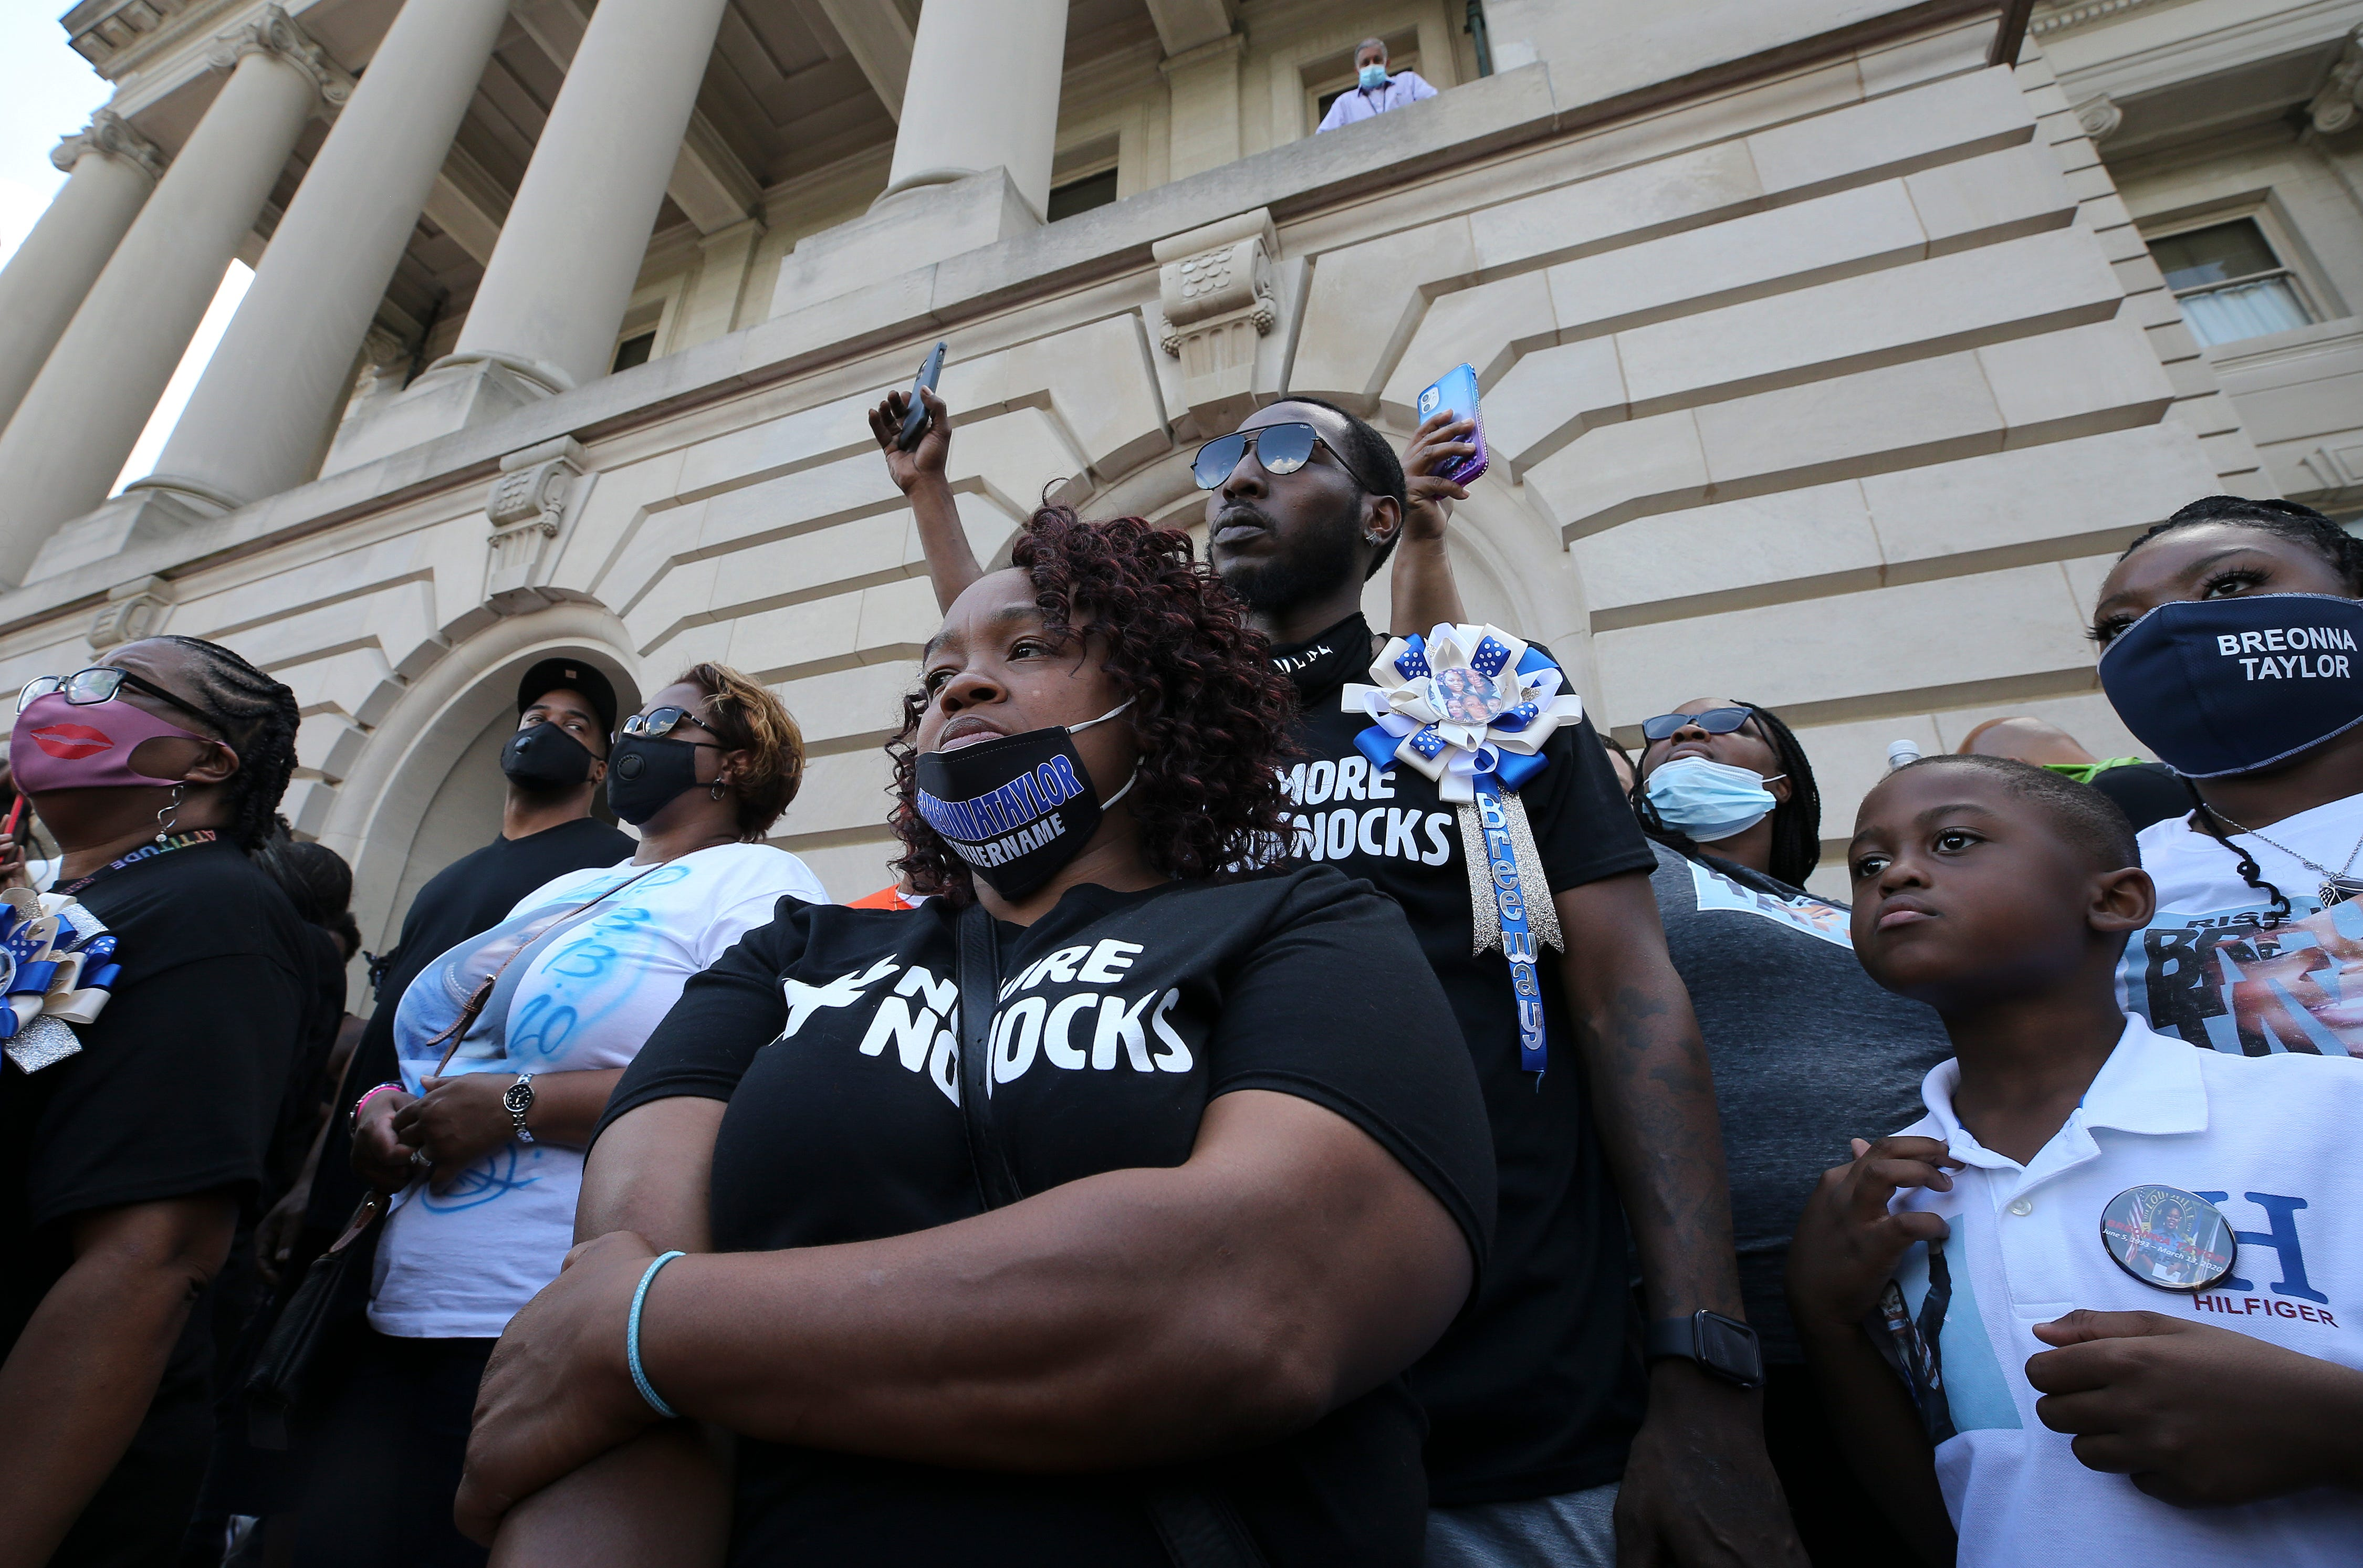 Breonna Taylor s mother endures national spotlight to make sure Black women s lives matter